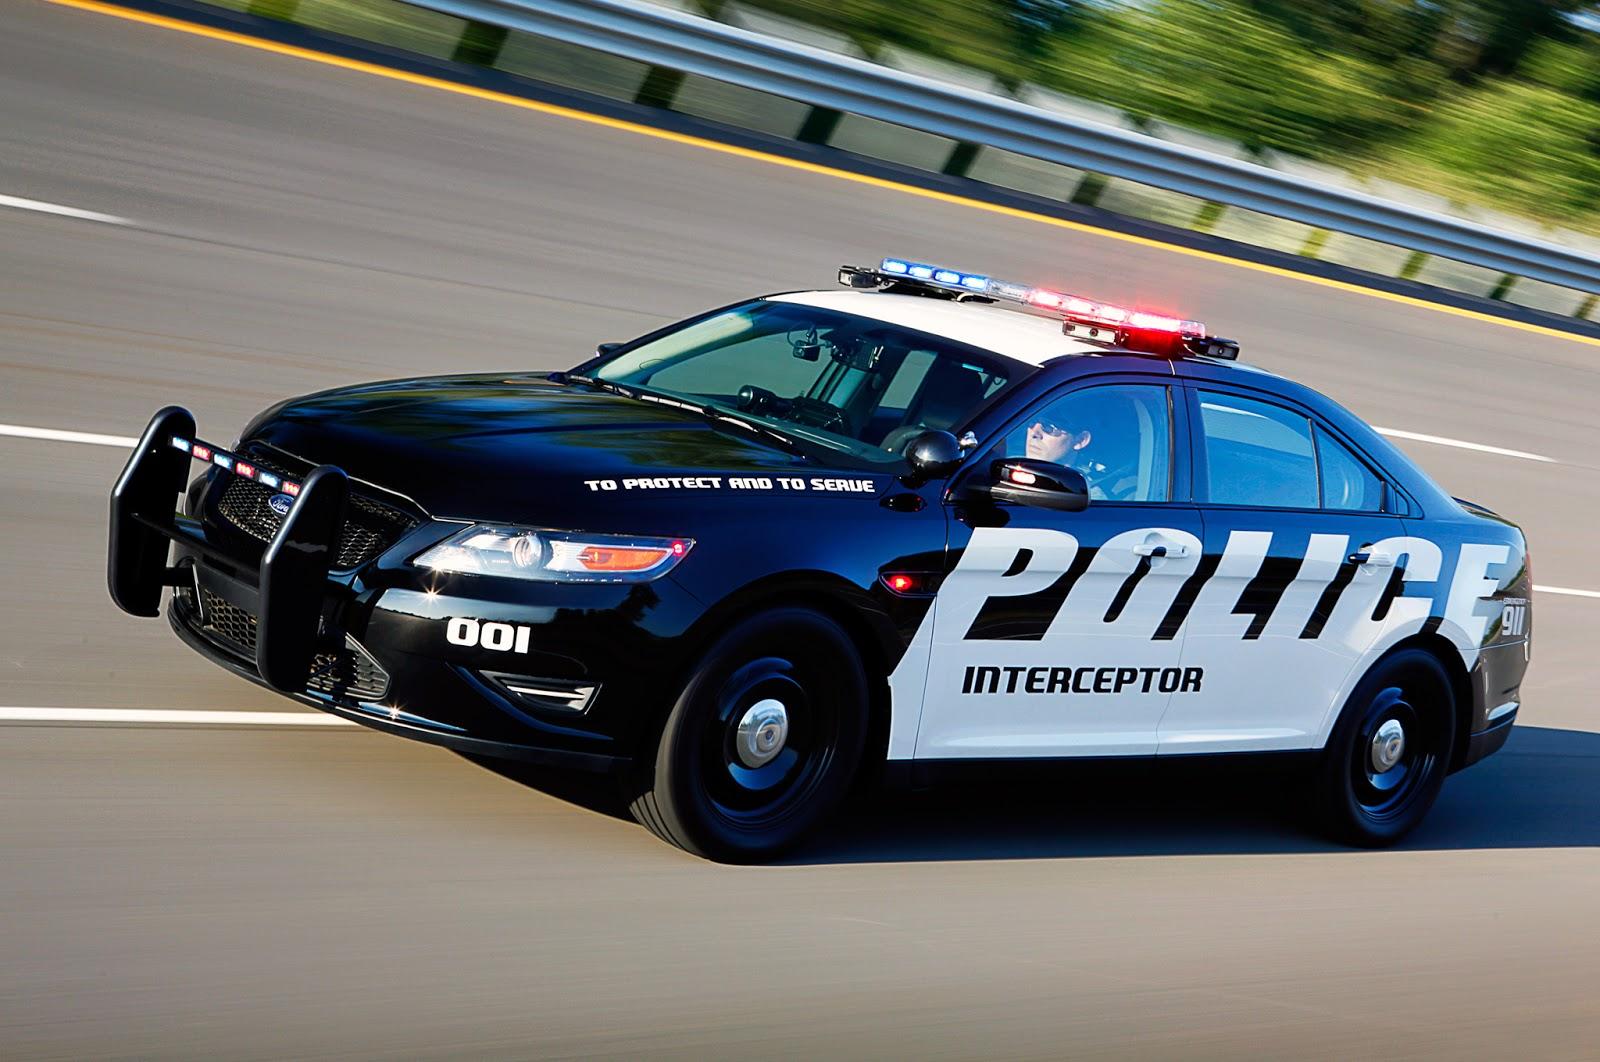 Police Car